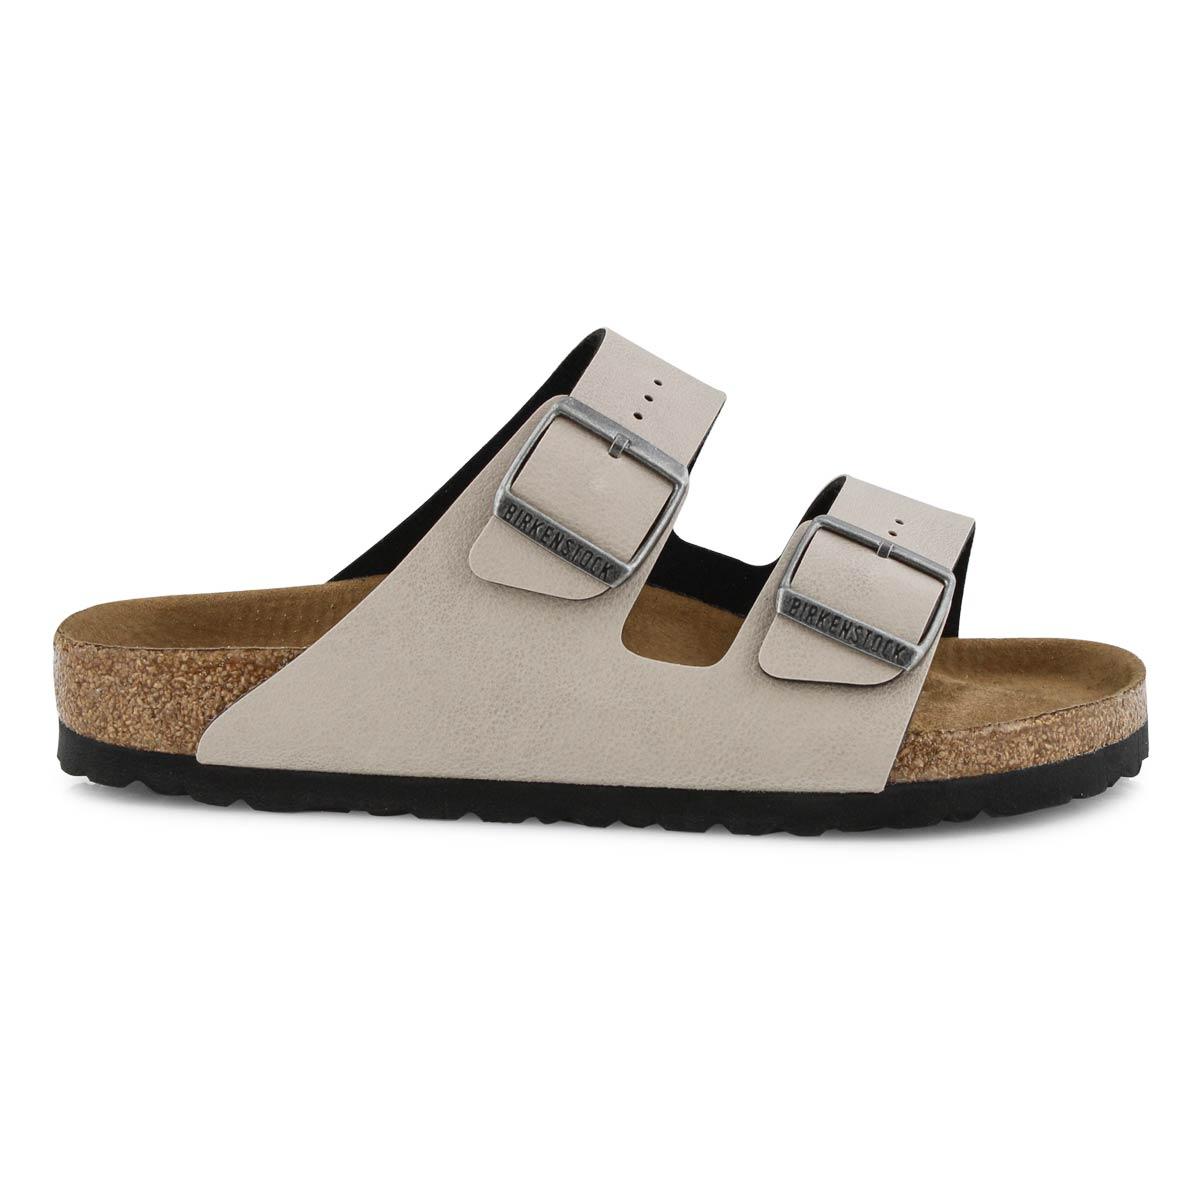 Lds Arizona Vegan stone slide sandal